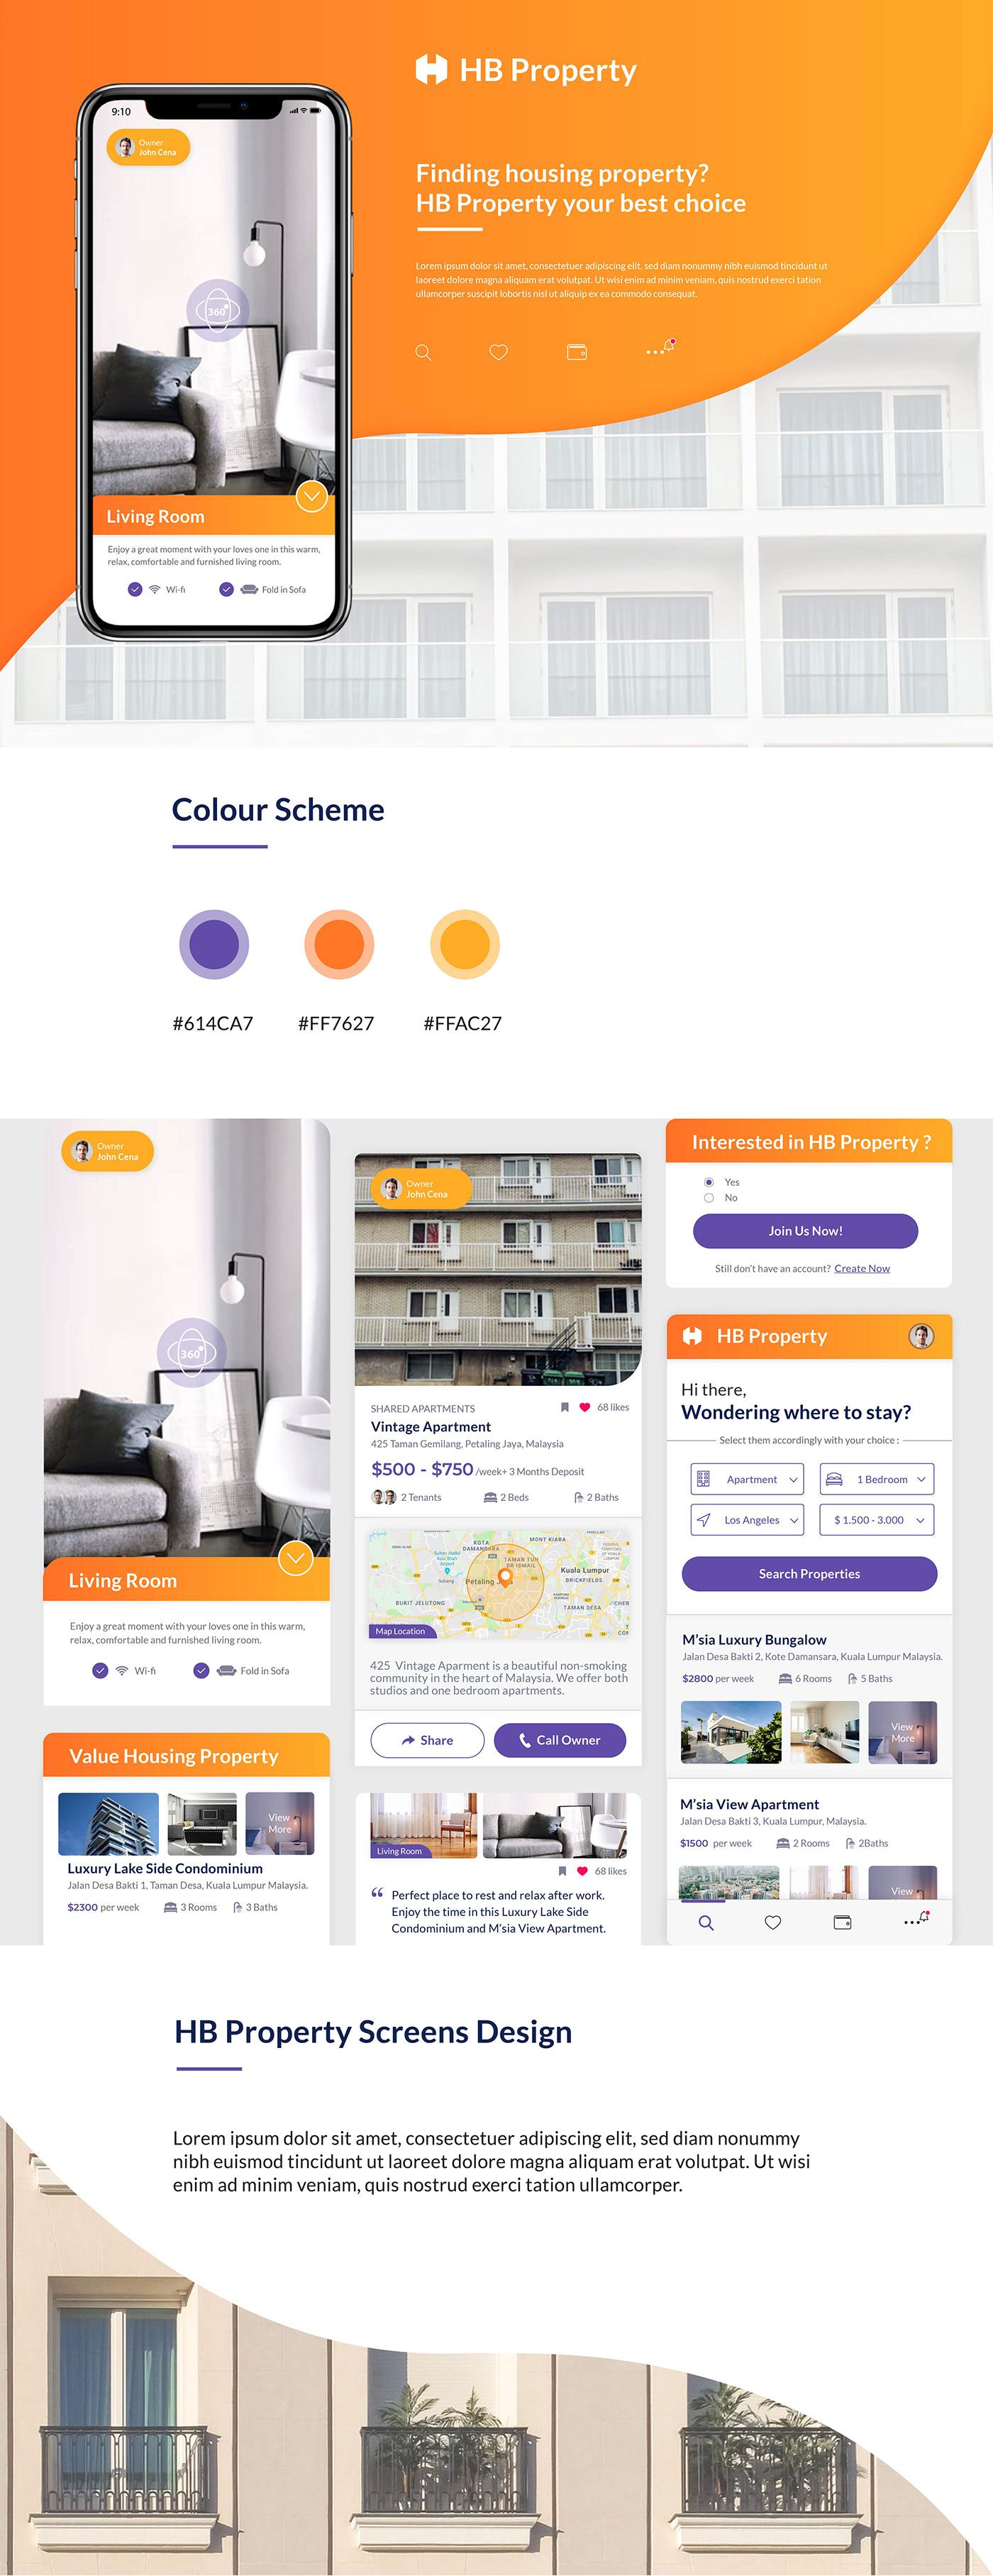 housing housing property Mobile app UI/UX Design uxarmy